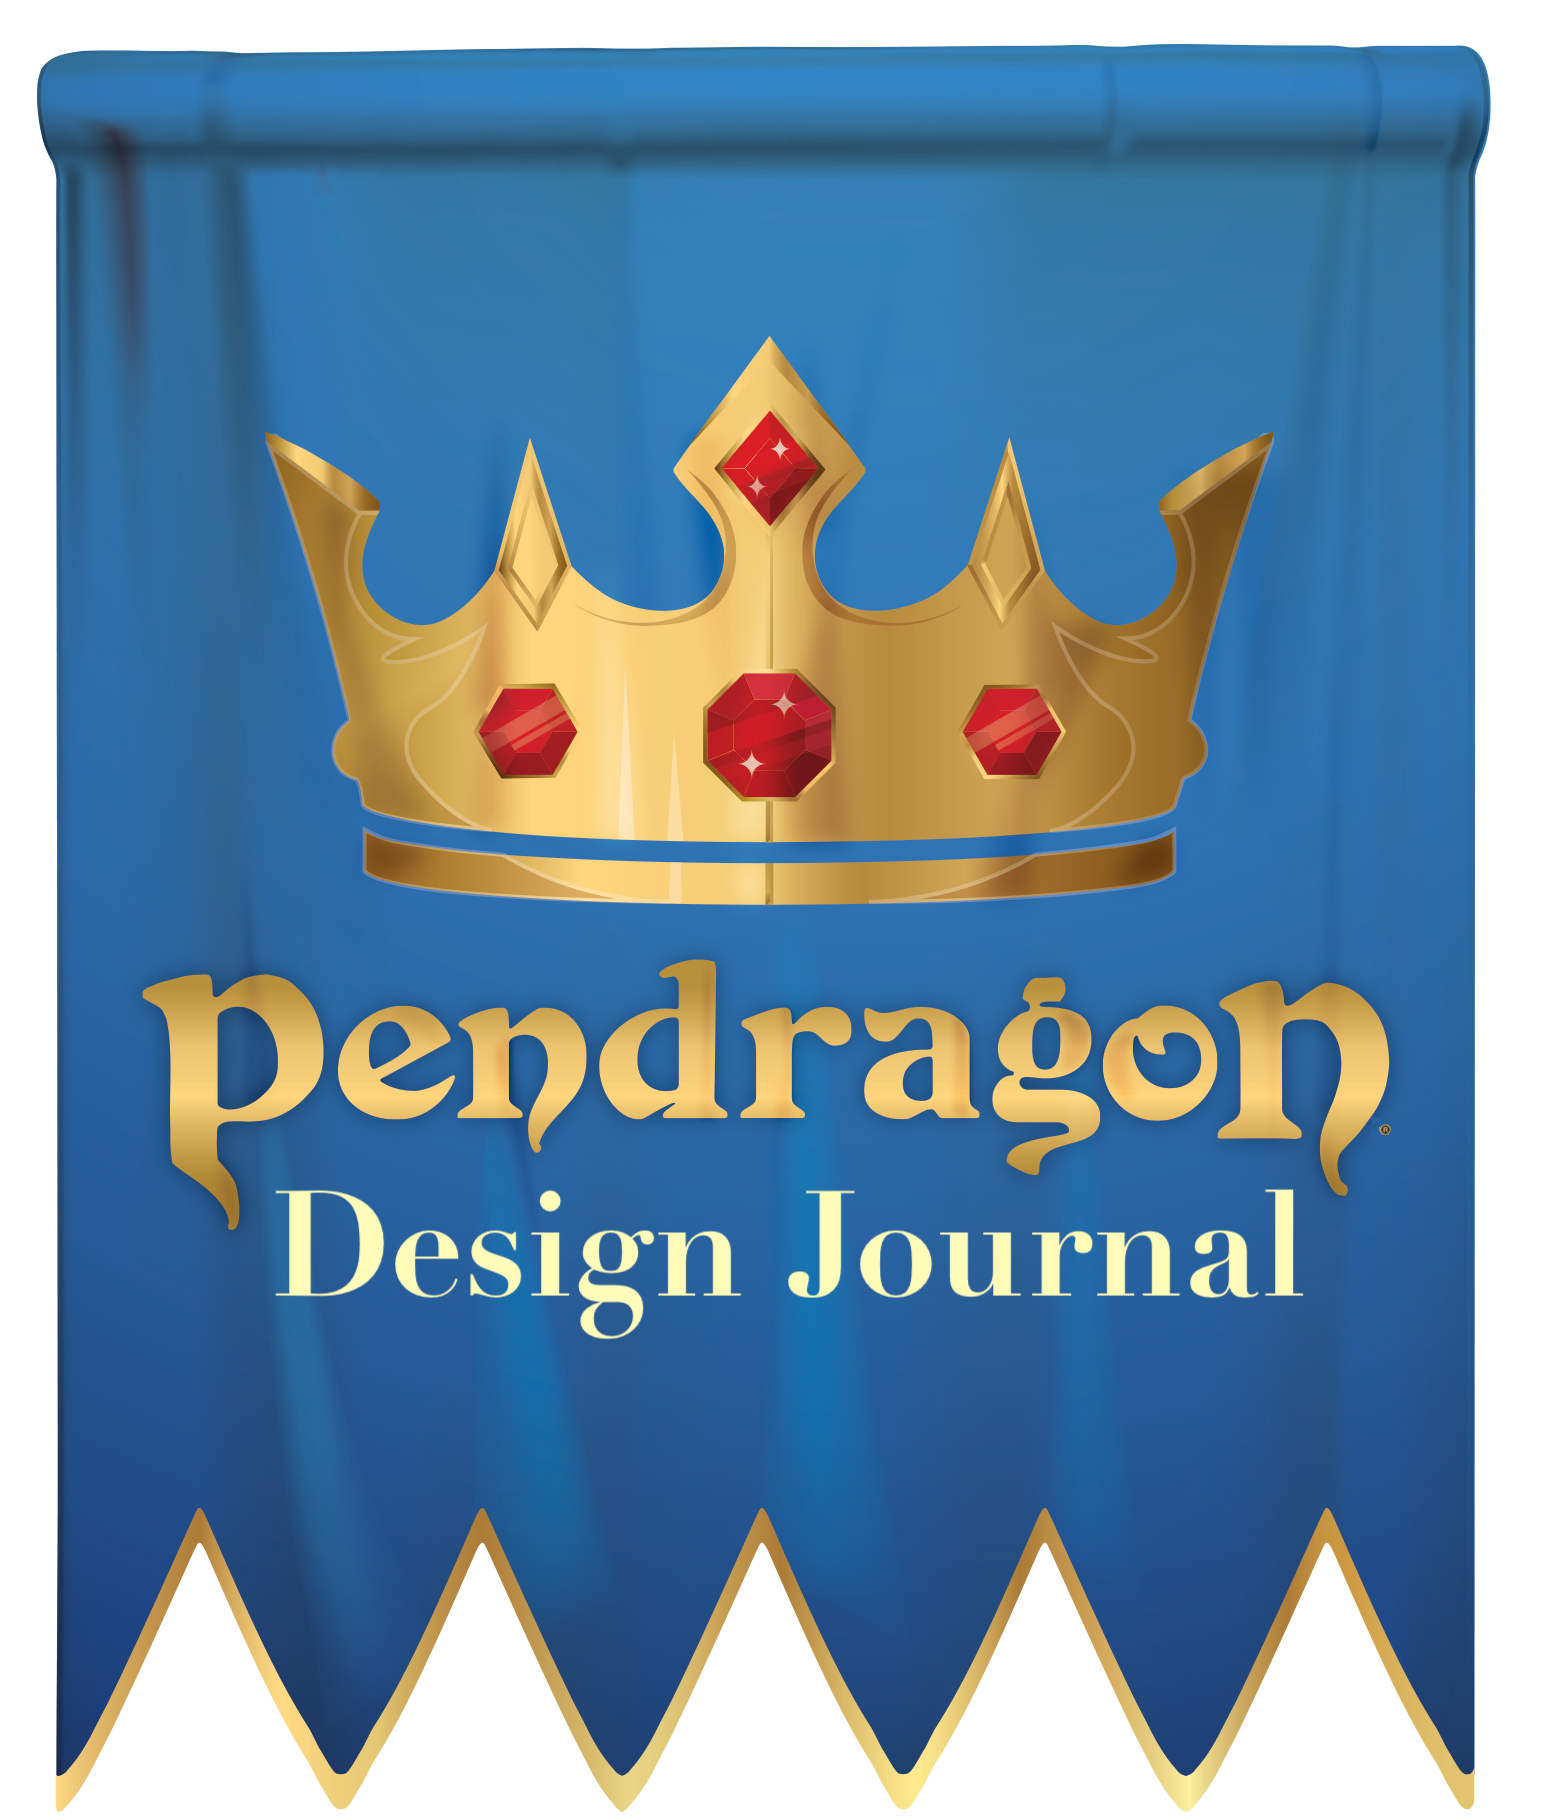 pendragon-design-journal.png